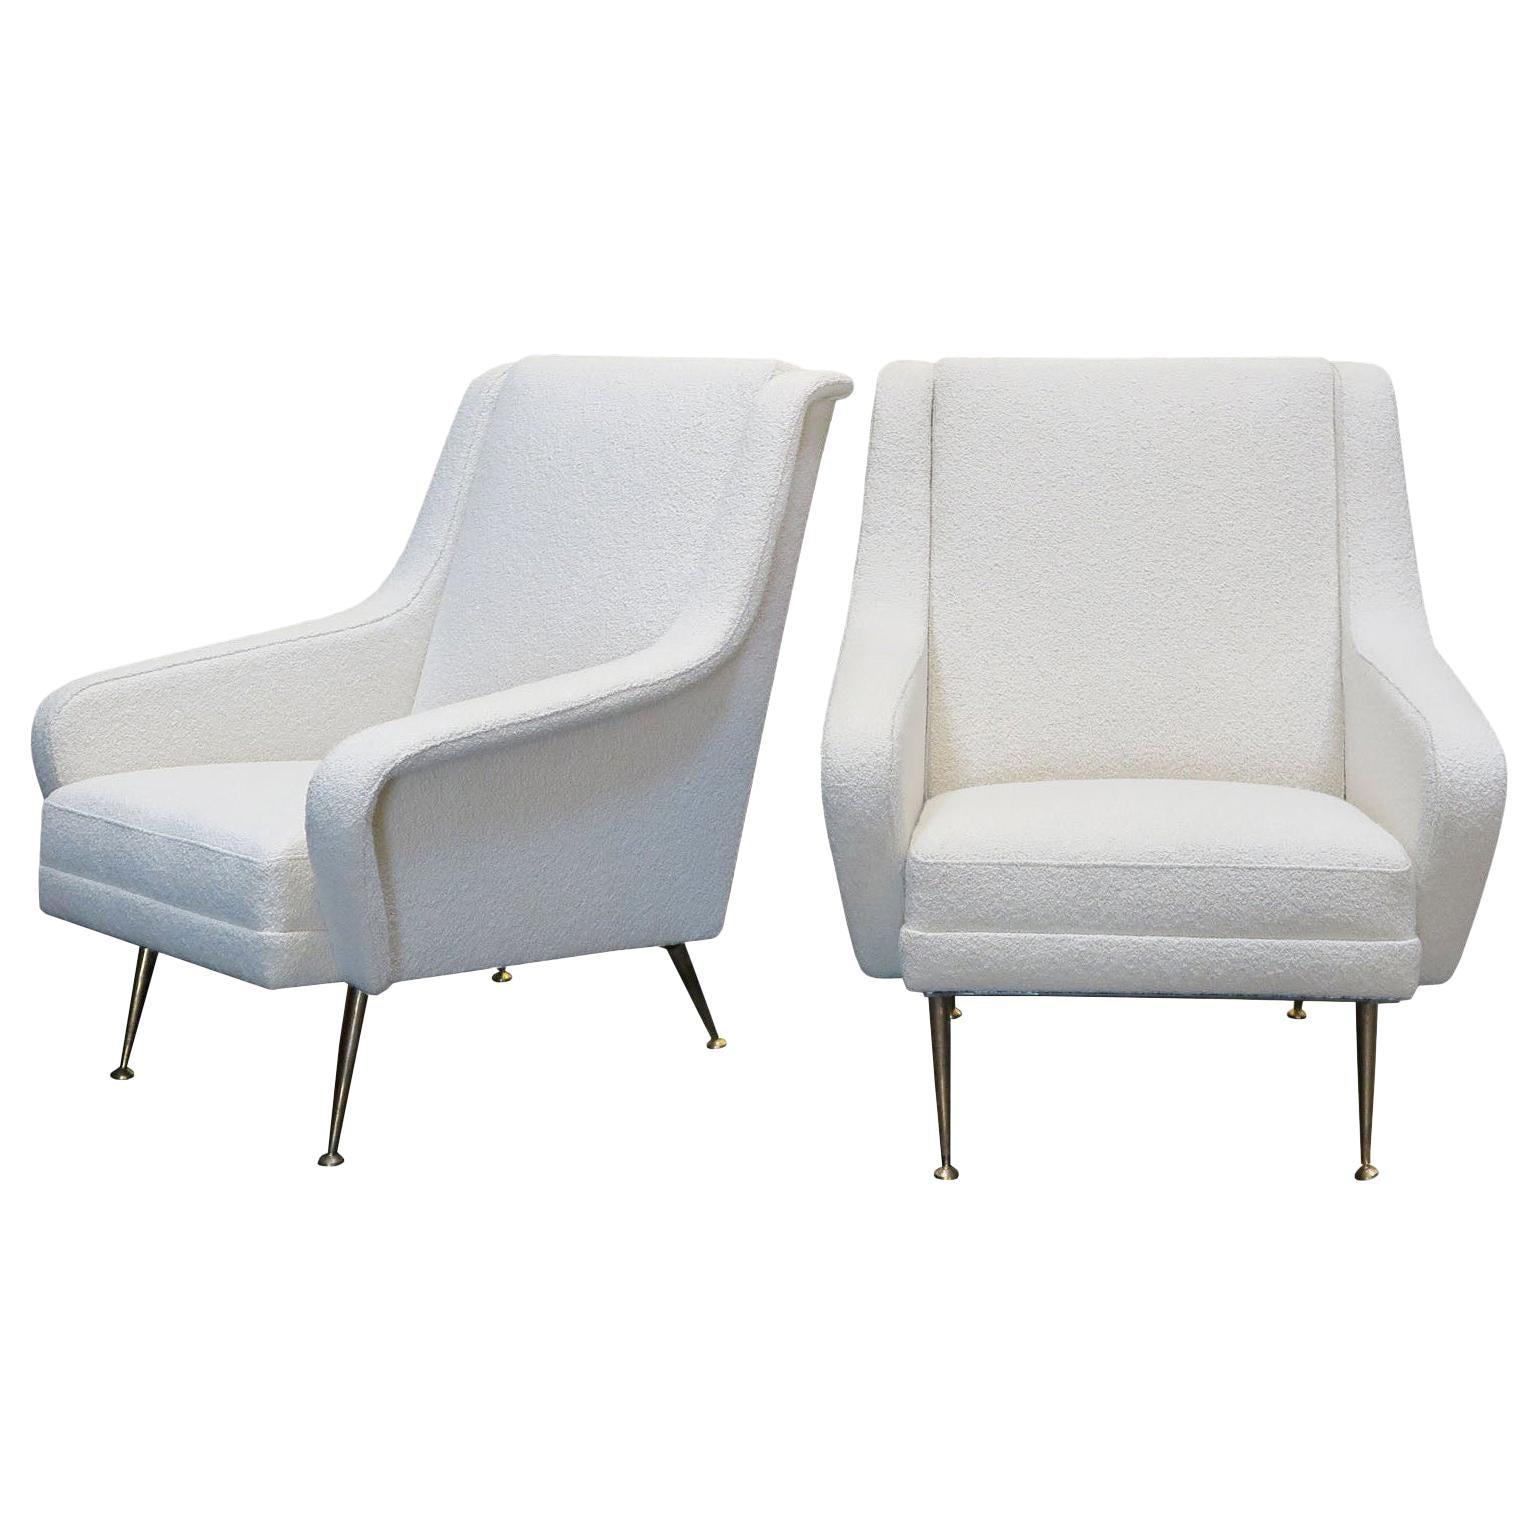 Pair of Mid-Century Modern Italian Lounge Chairs by Carlo de Carli, circa 1960s